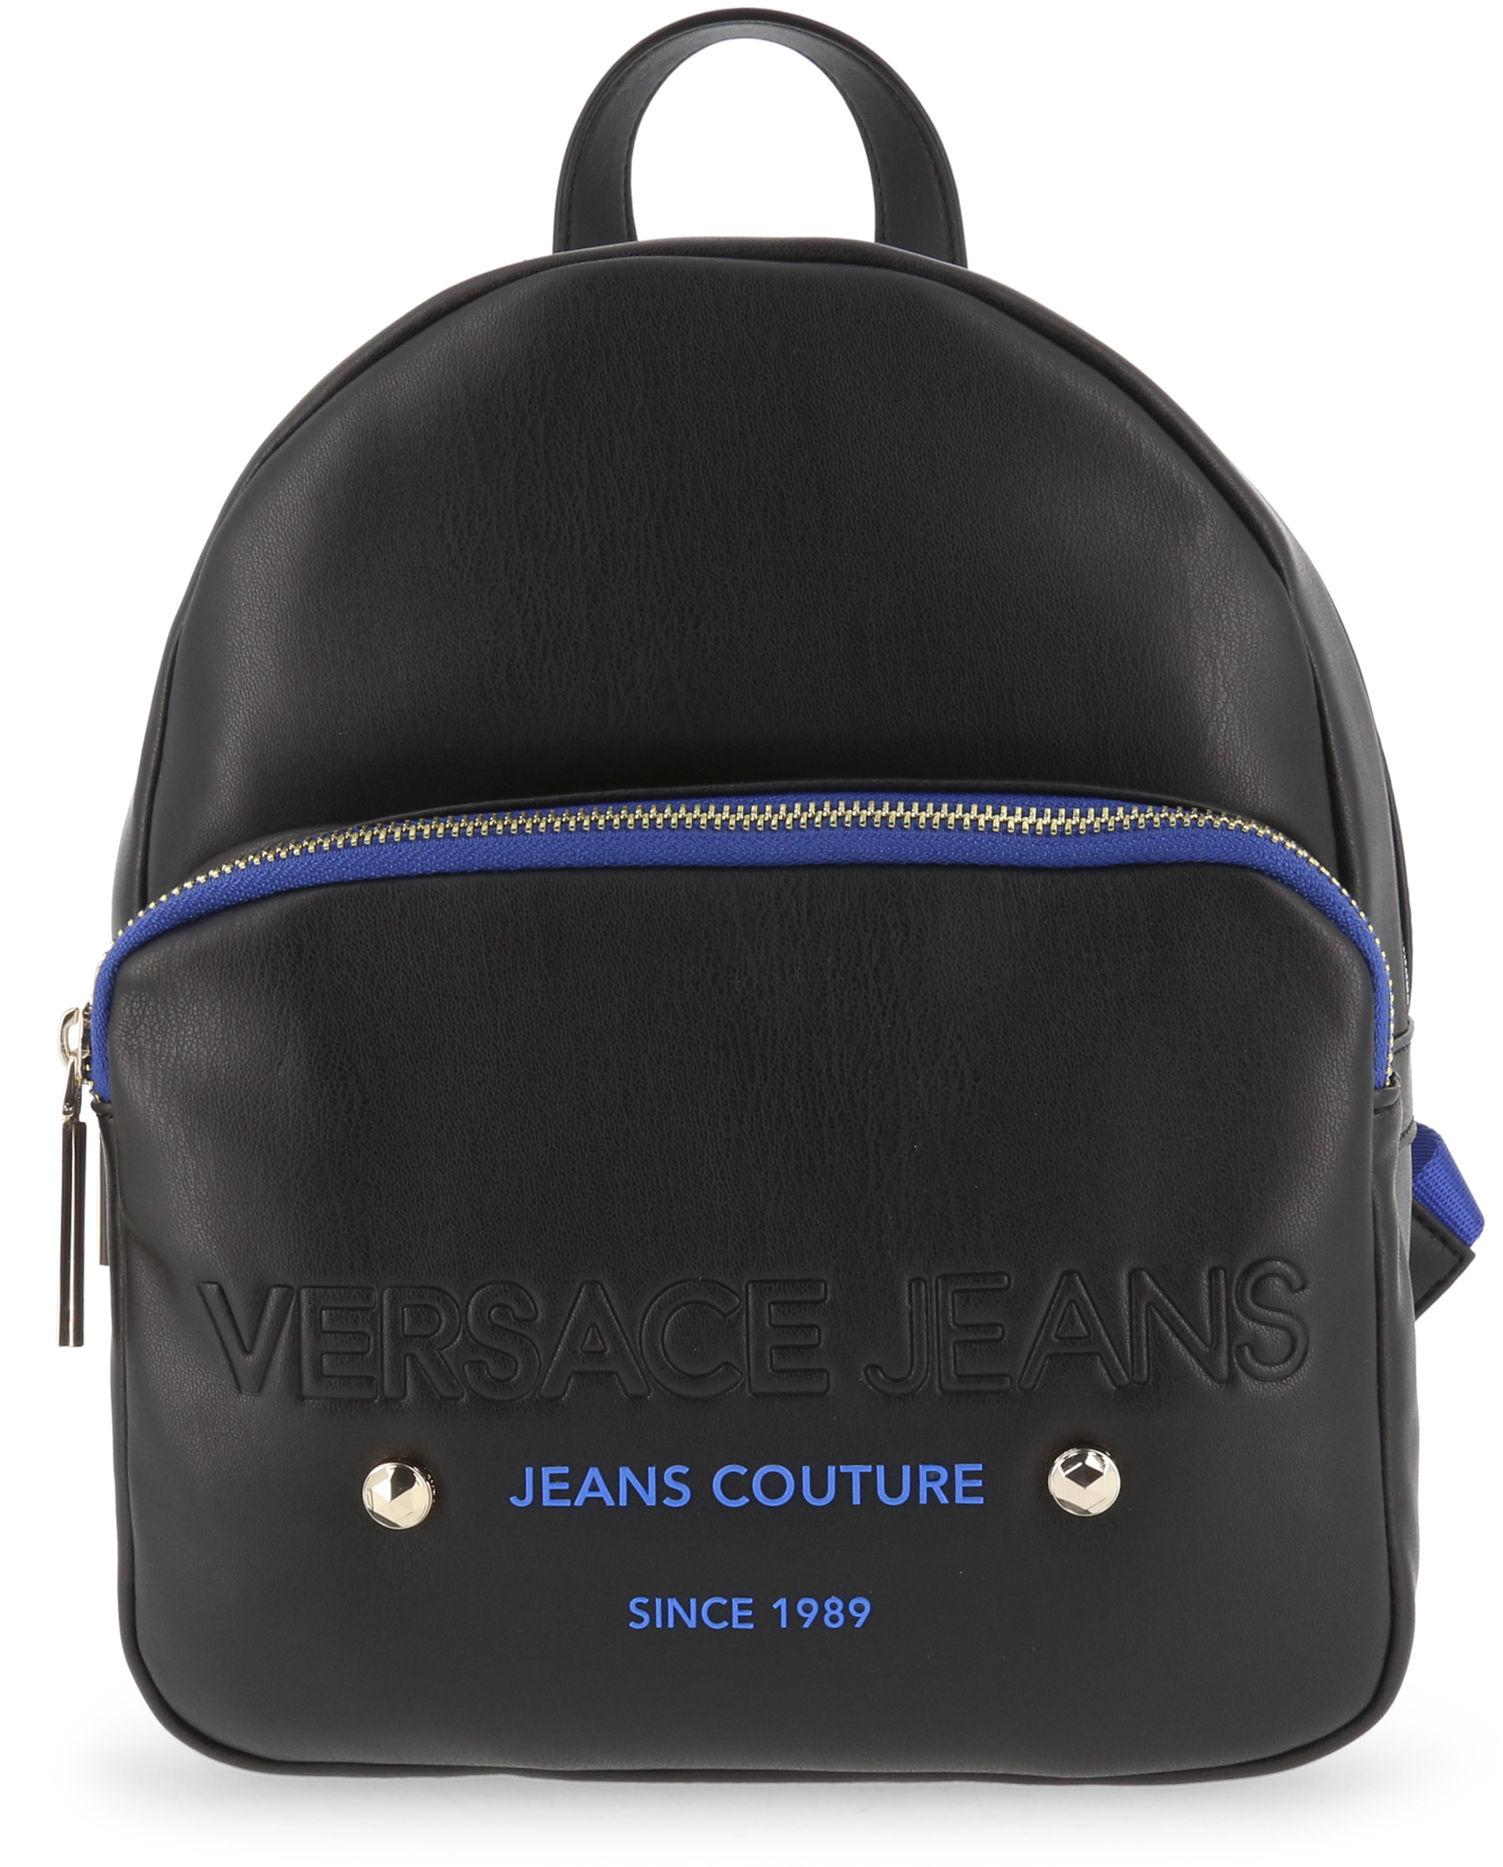 Versace Jeans Plecak Damski